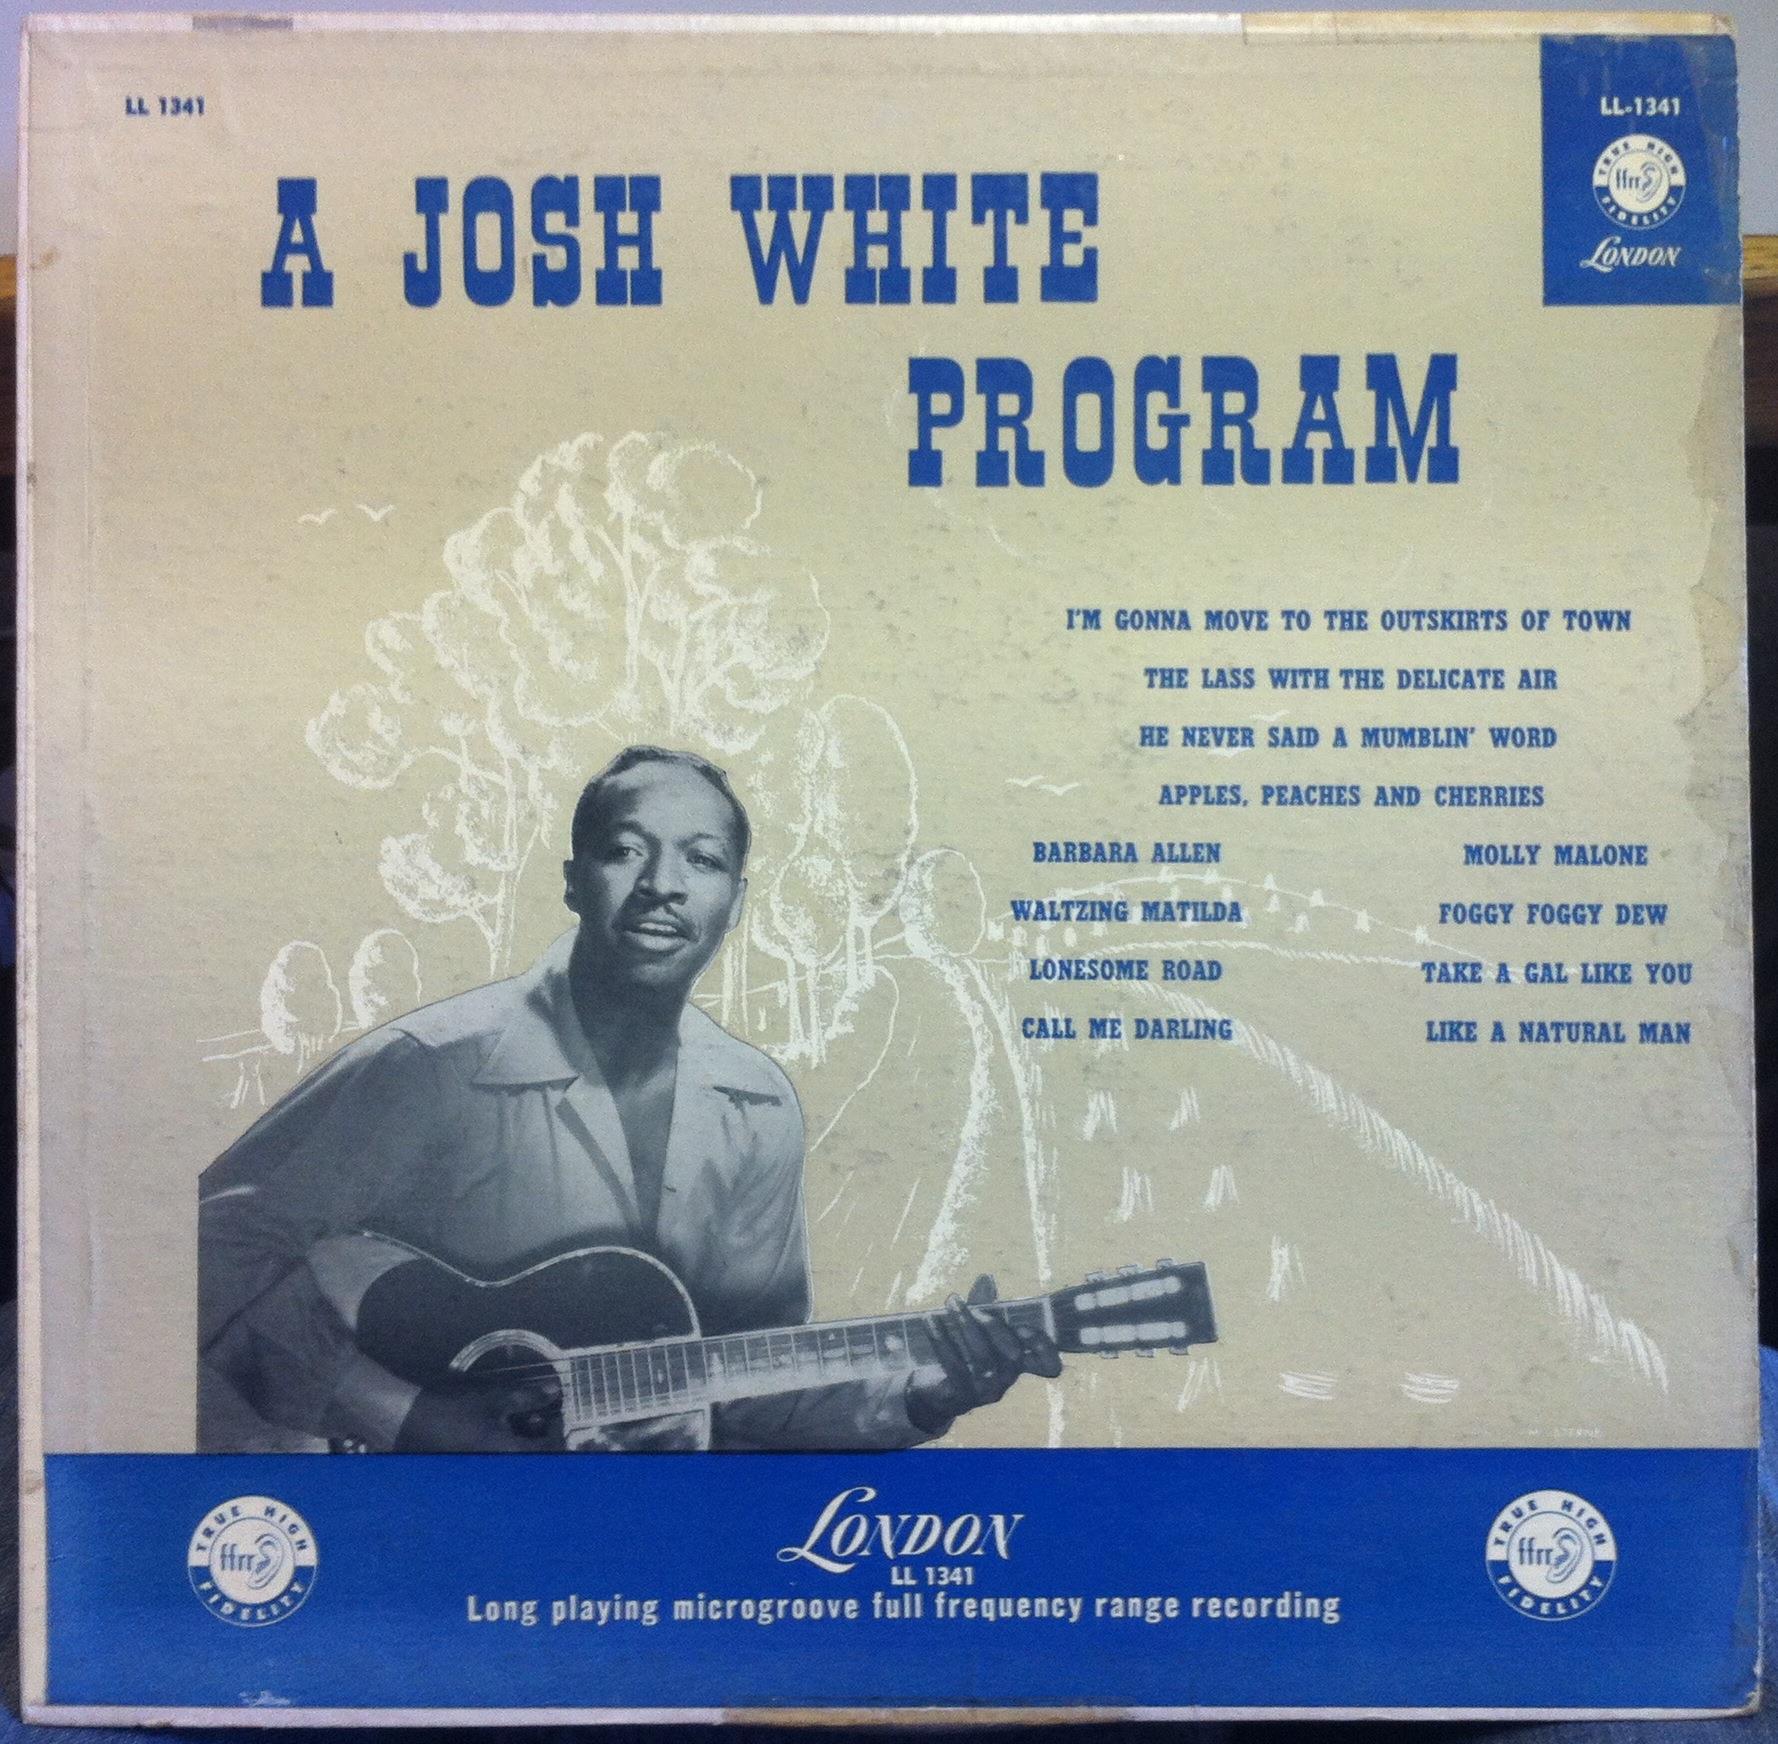 JOSH WHITE - Josh White The Program Lp Vg Ll 1341 Uk Ffrr Mono 1956 Folk (the Program)